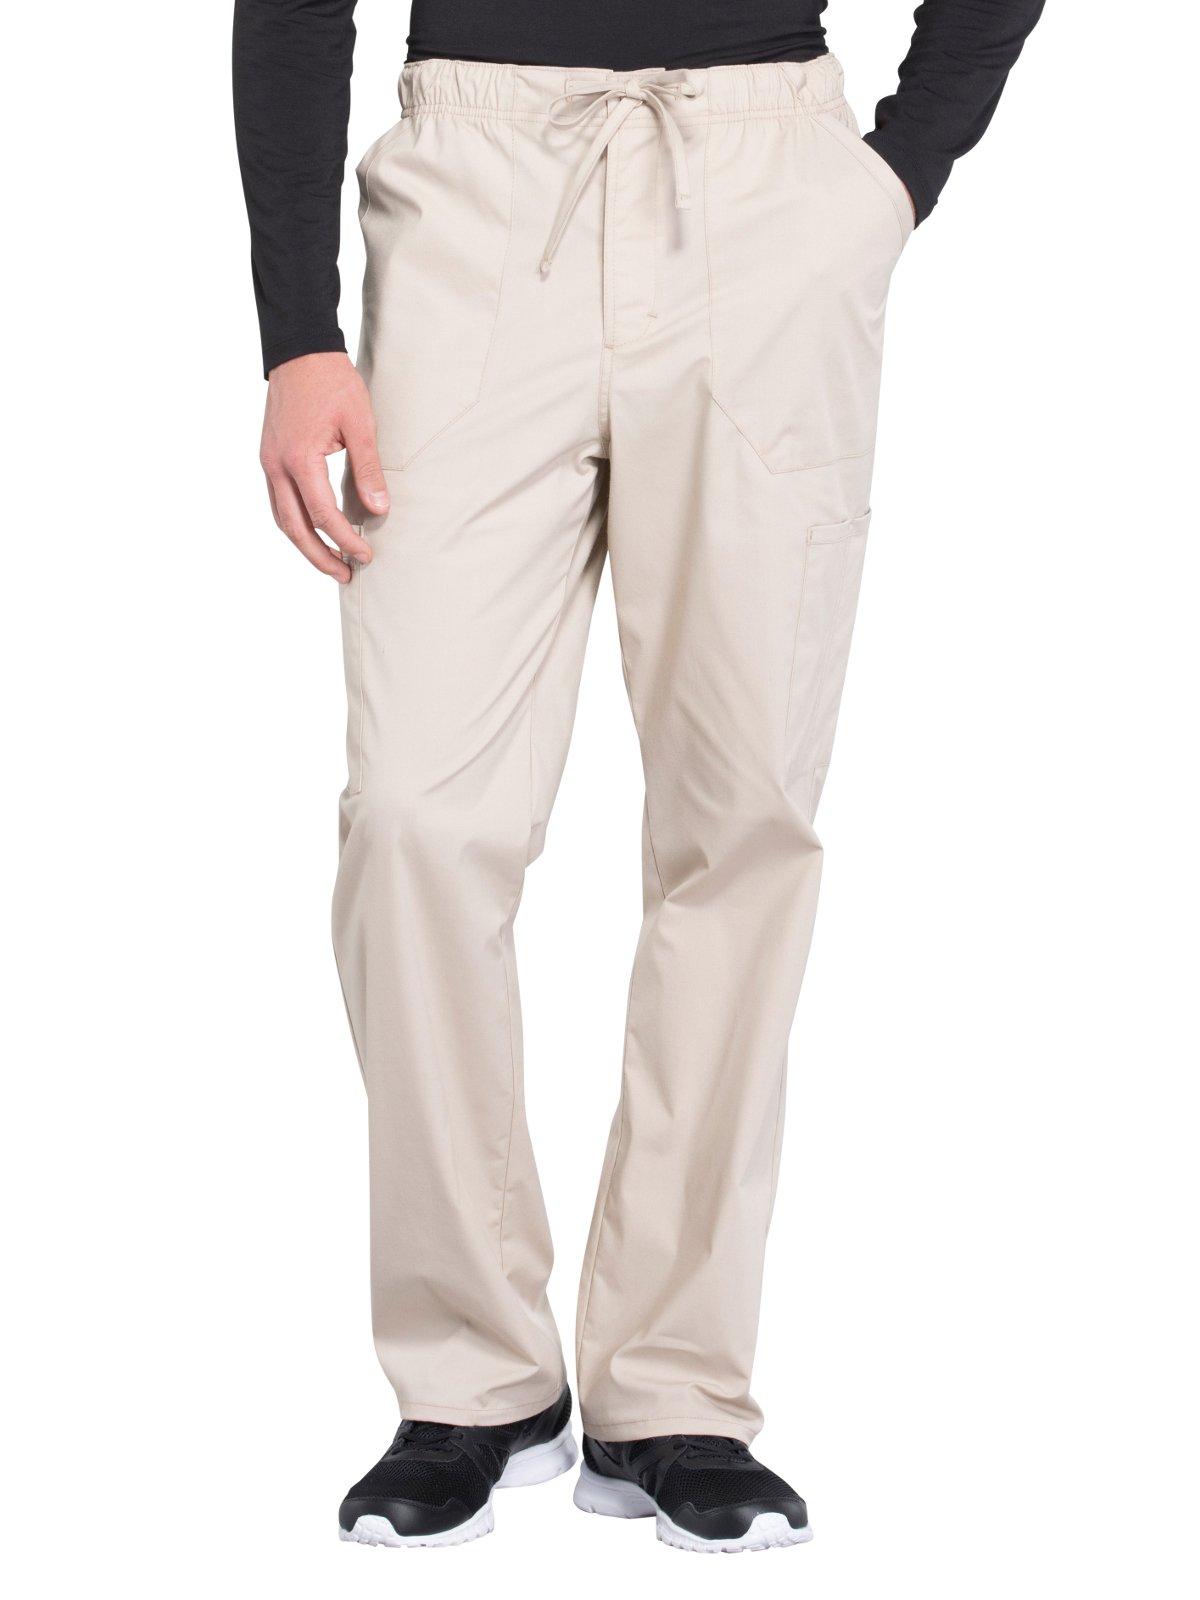 Cherokee WW Professionals WW190 Men's Tapered Leg Drawstring Cargo Pant Khaki 2XL Short by Cherokee